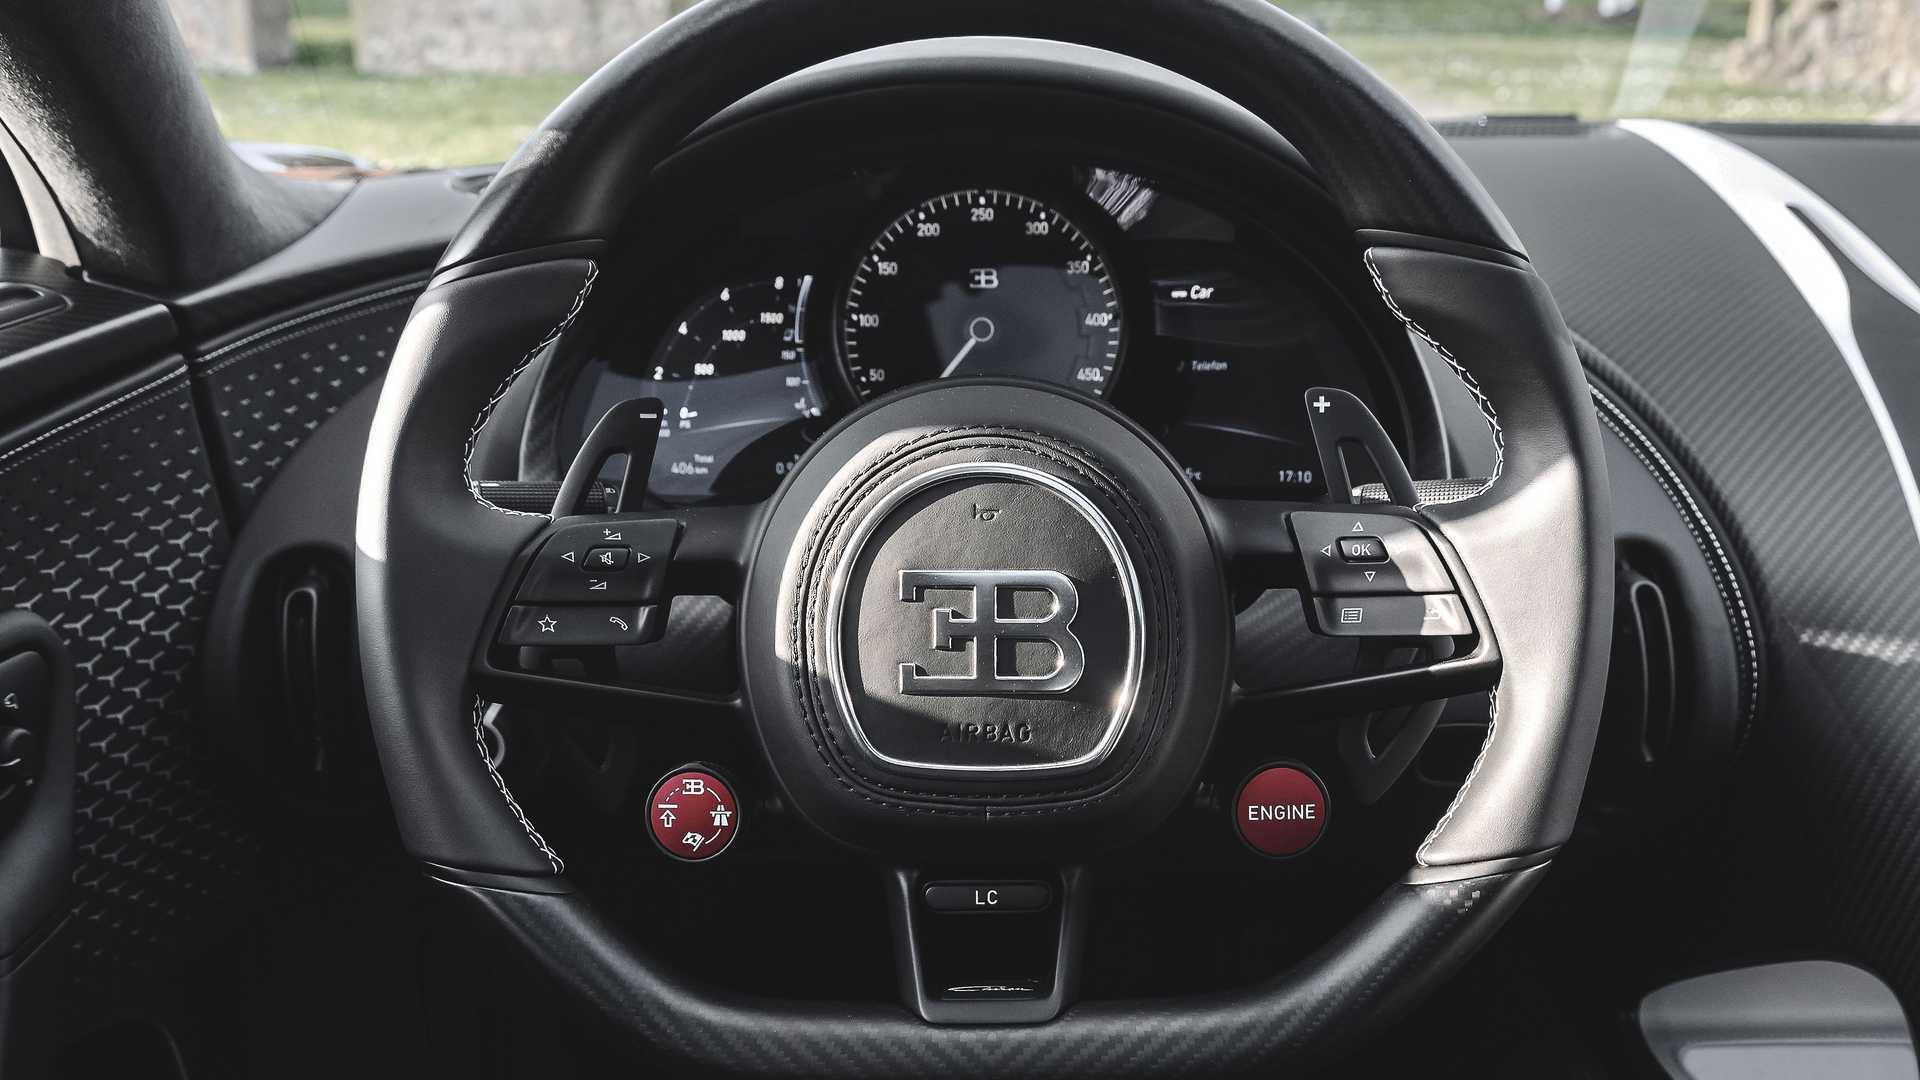 2021 Bugatti Chiron Steering Wheel